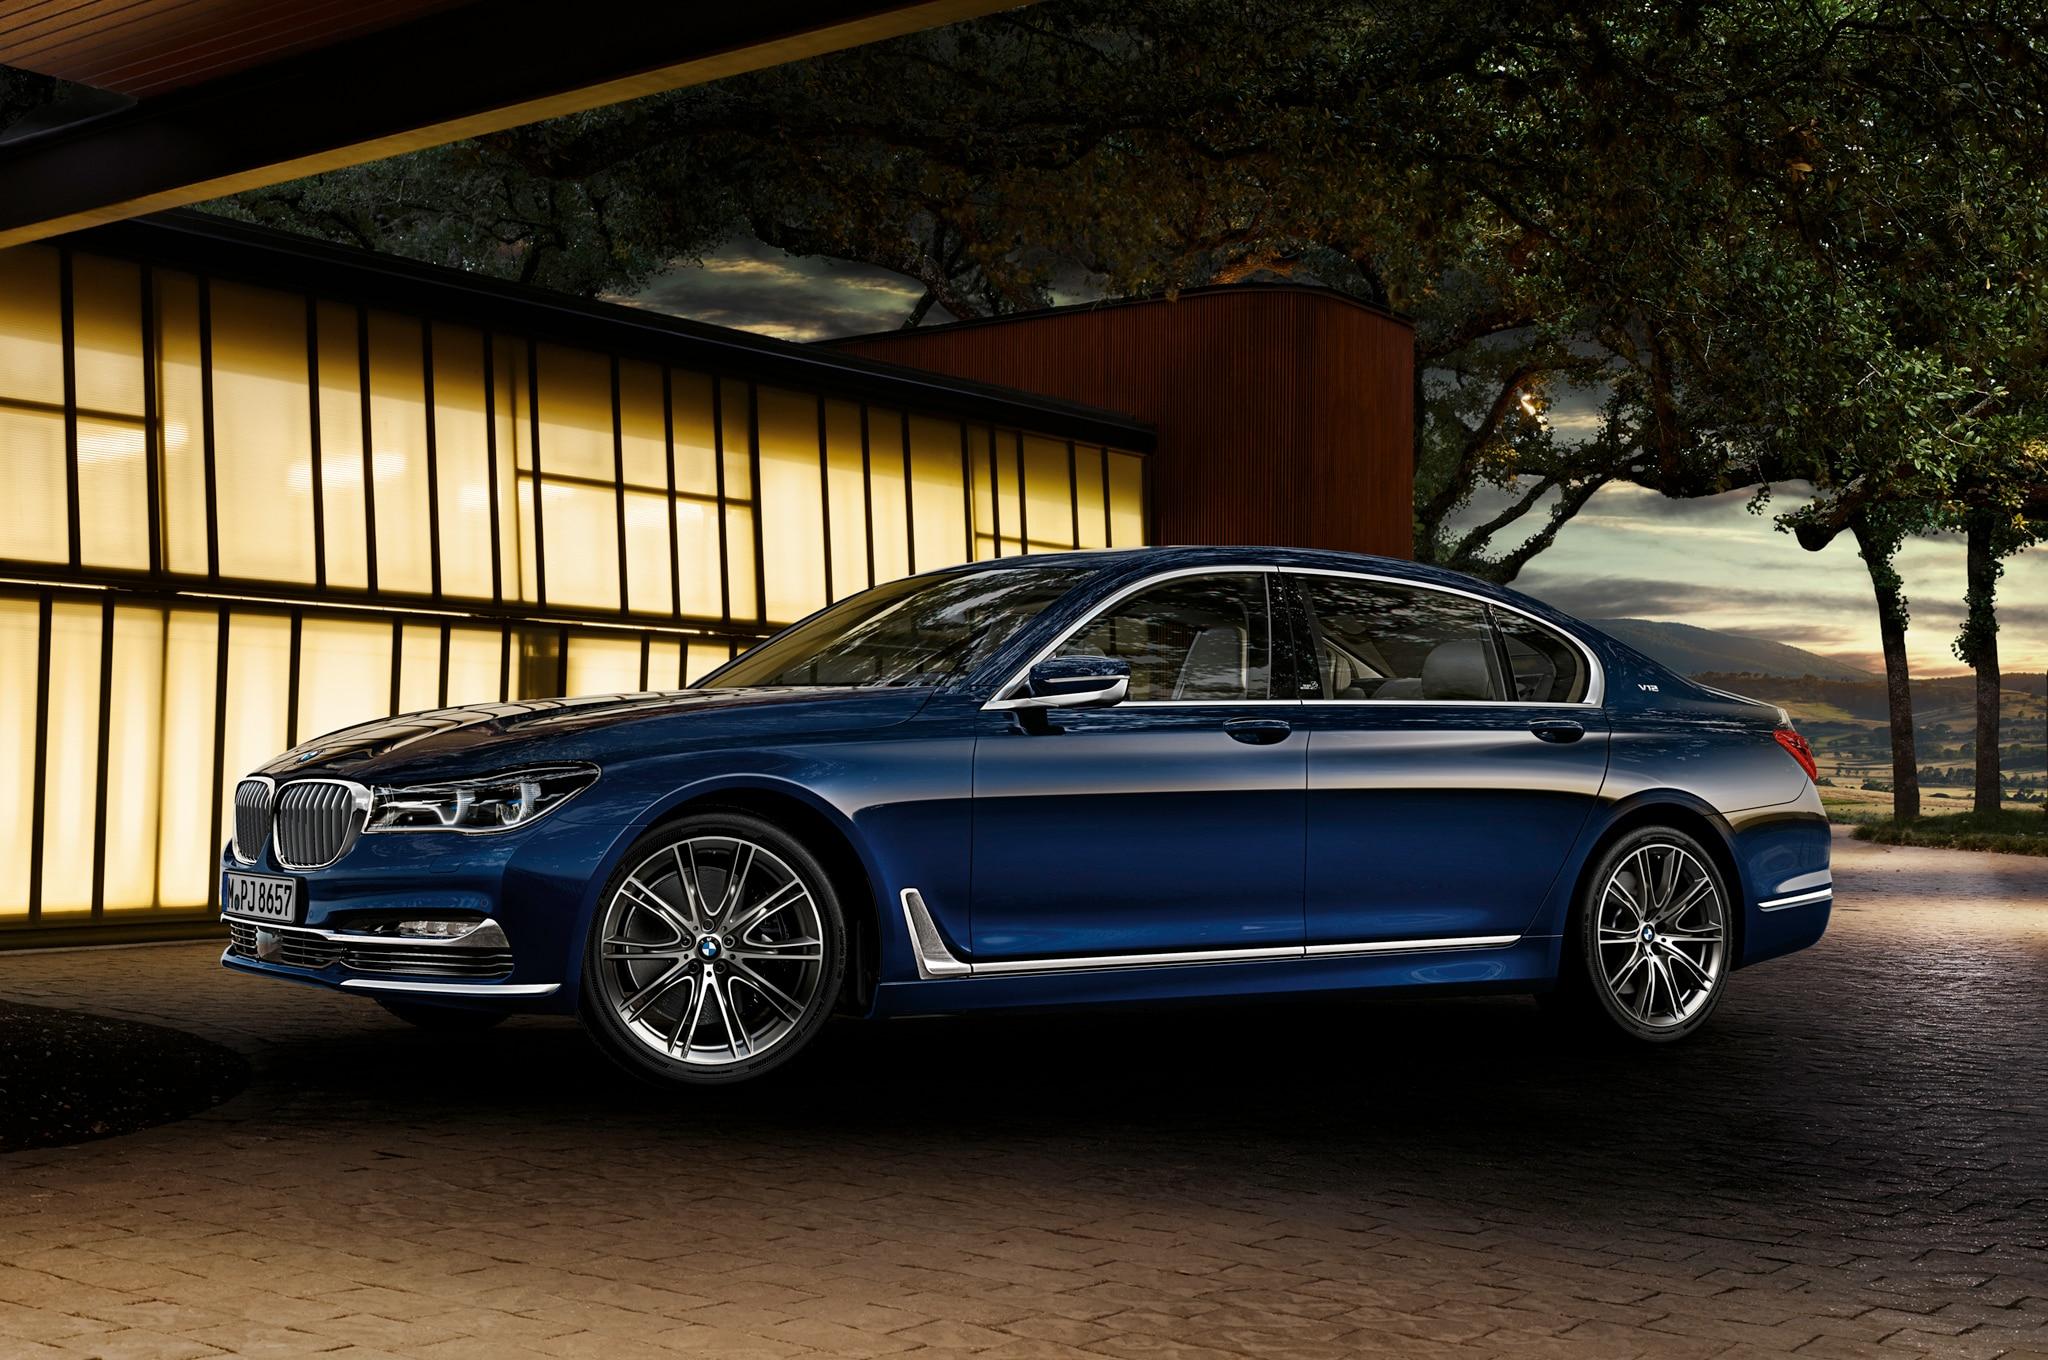 Special Edition 7 Series Celebrates BMWs Centennial